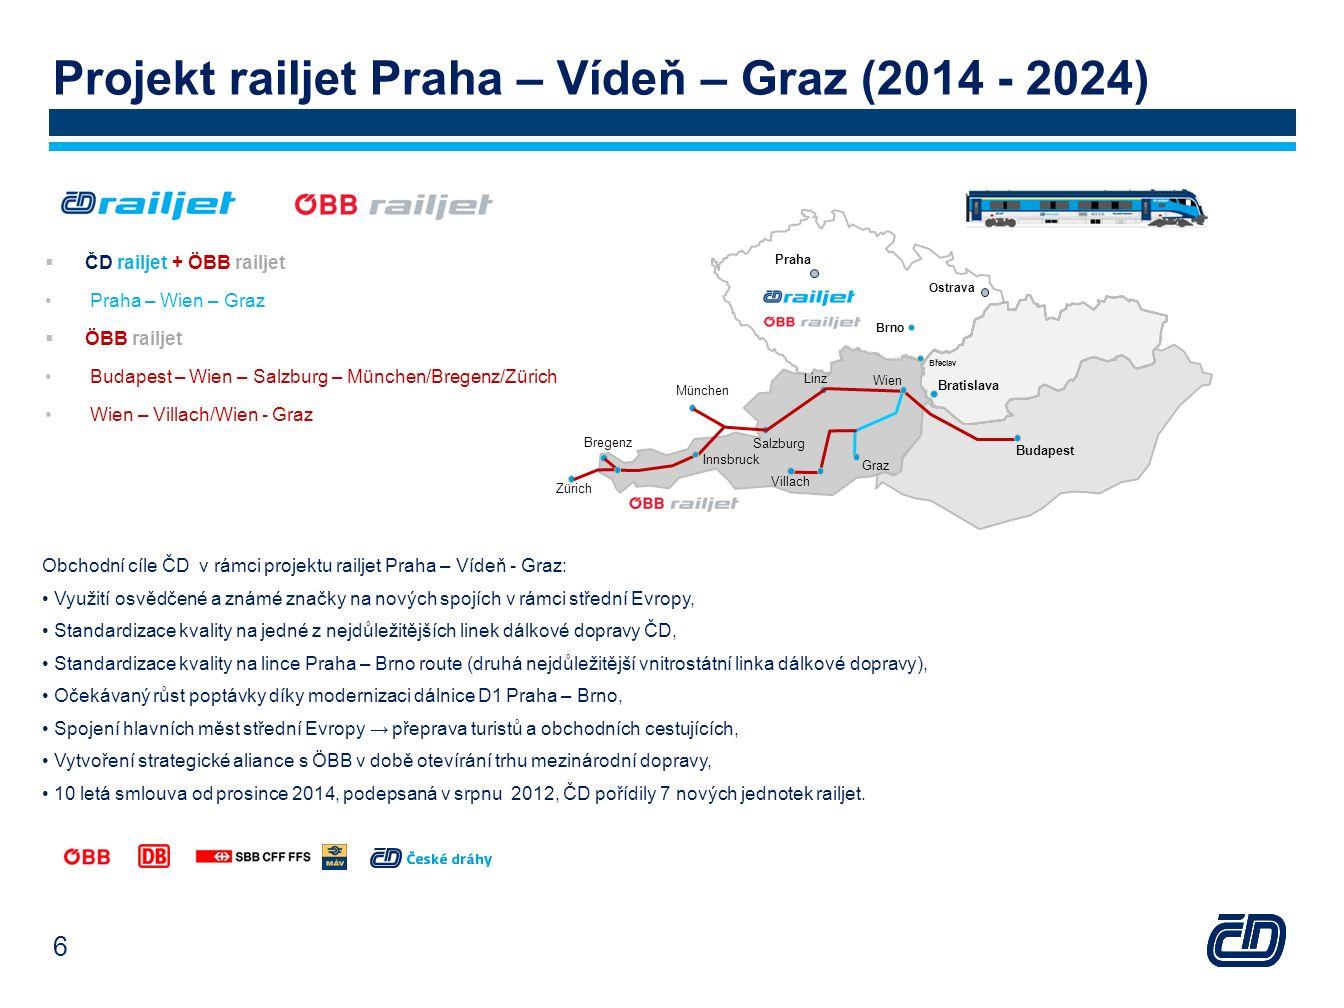 Projekt railjet Praha – Vídeň – Graz (2014 - 2024) 6  ČD railjet + ÖBB railjet Praha – Wien – Graz  ÖBB railjet Budapest – Wien – Salzburg – München